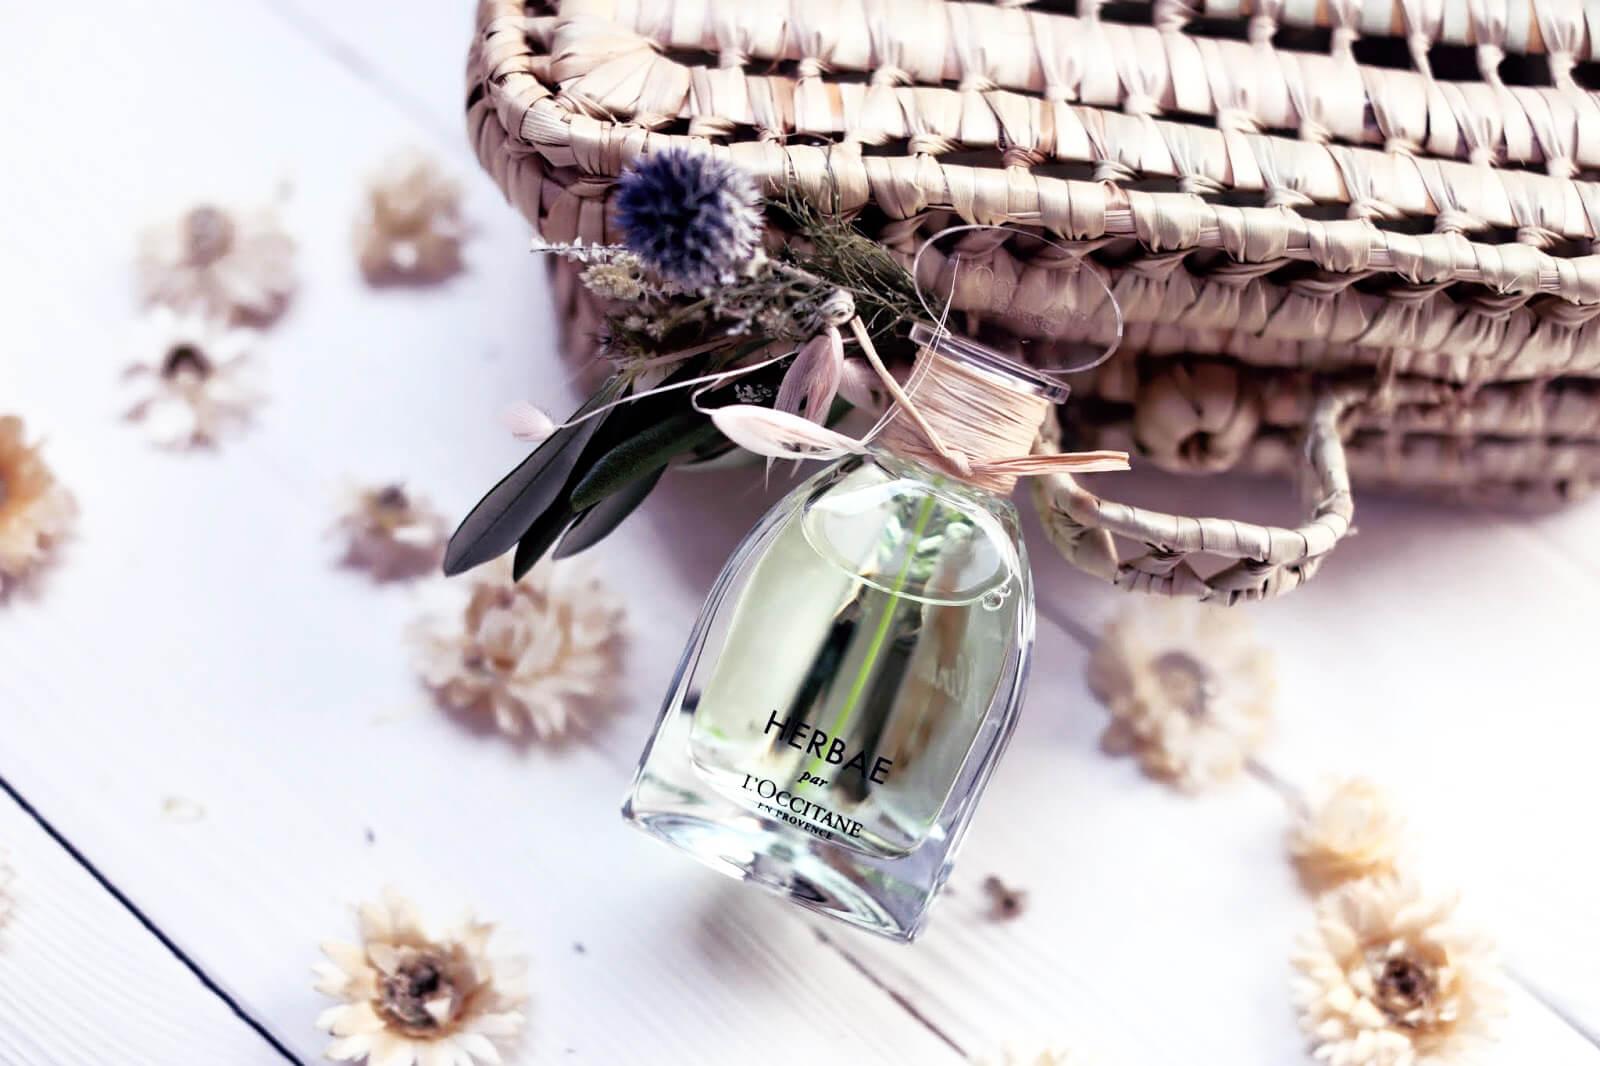 HerbaeUn Parfum Inspiré FraicheKleo L'occitane L'herbe Par j5q34ARL